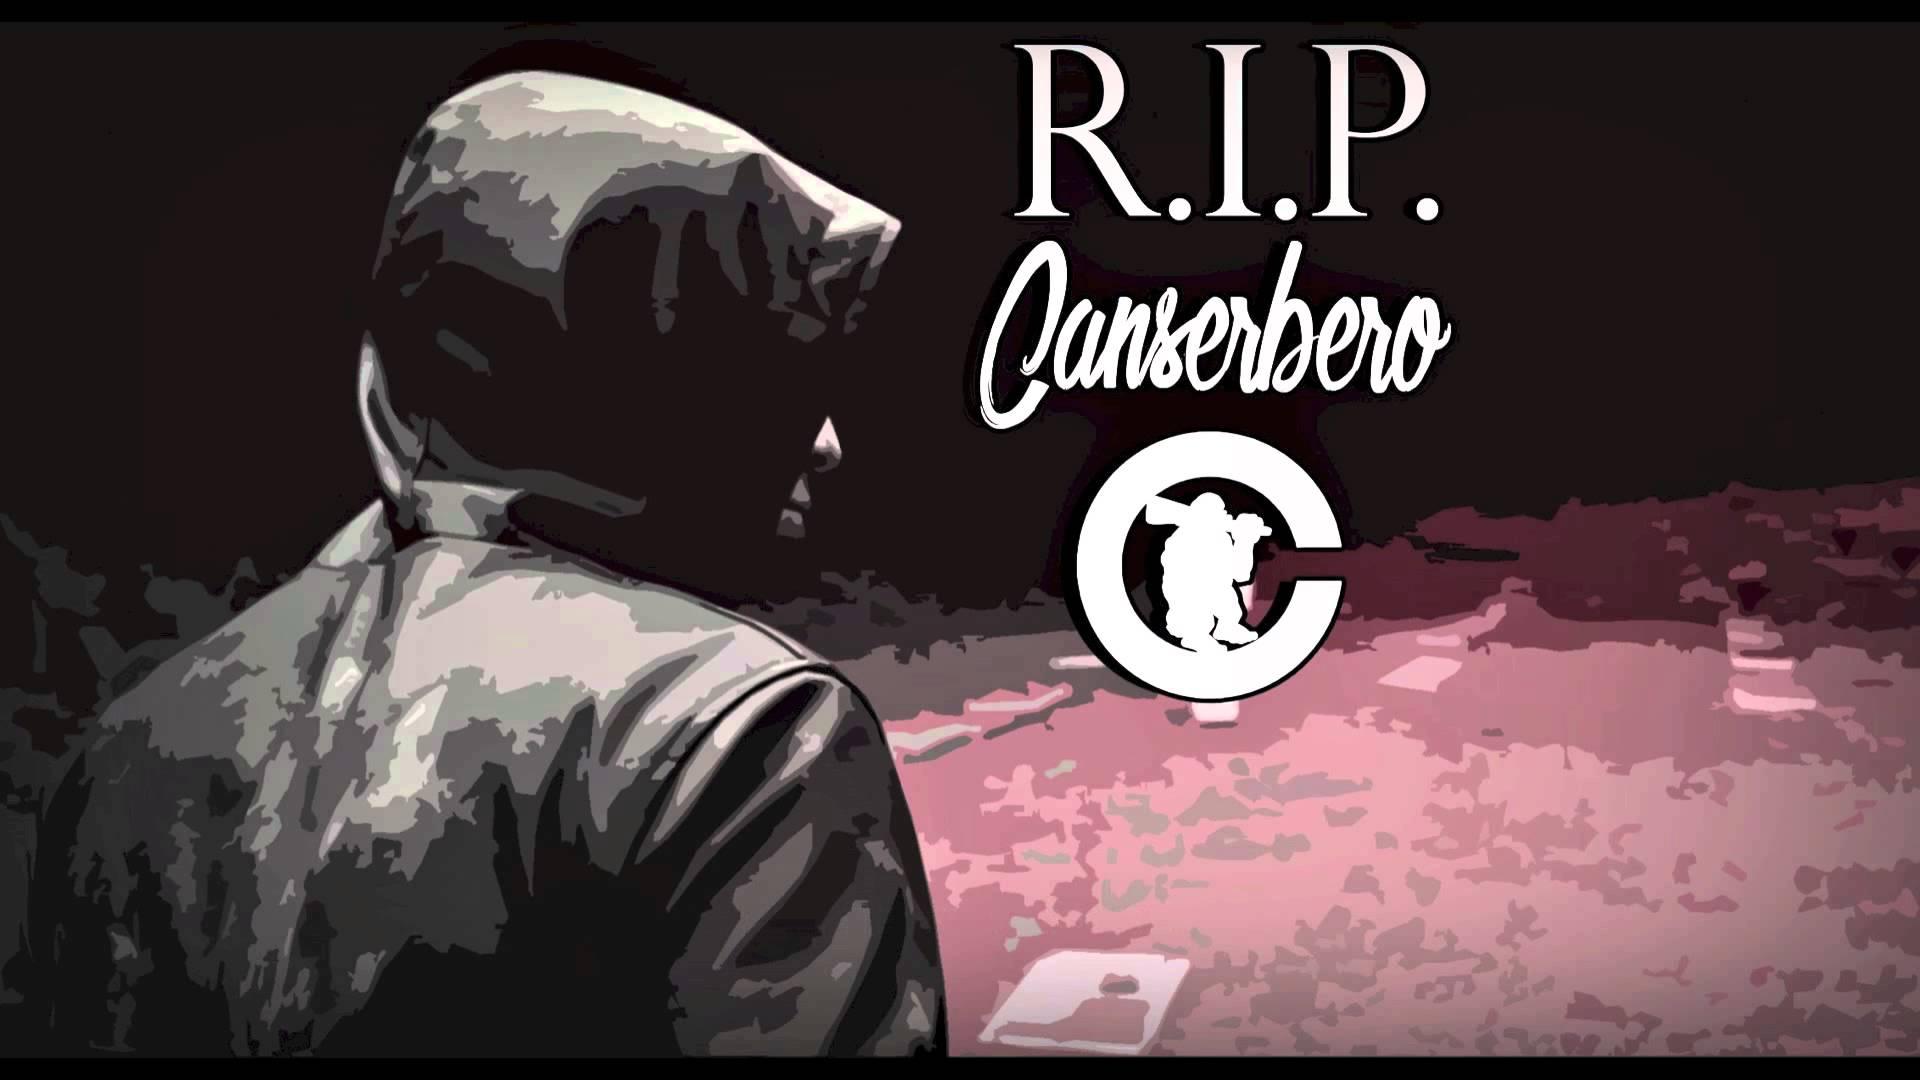 Danman y Deflow – R.I.P Canserbero (Lyric Video)